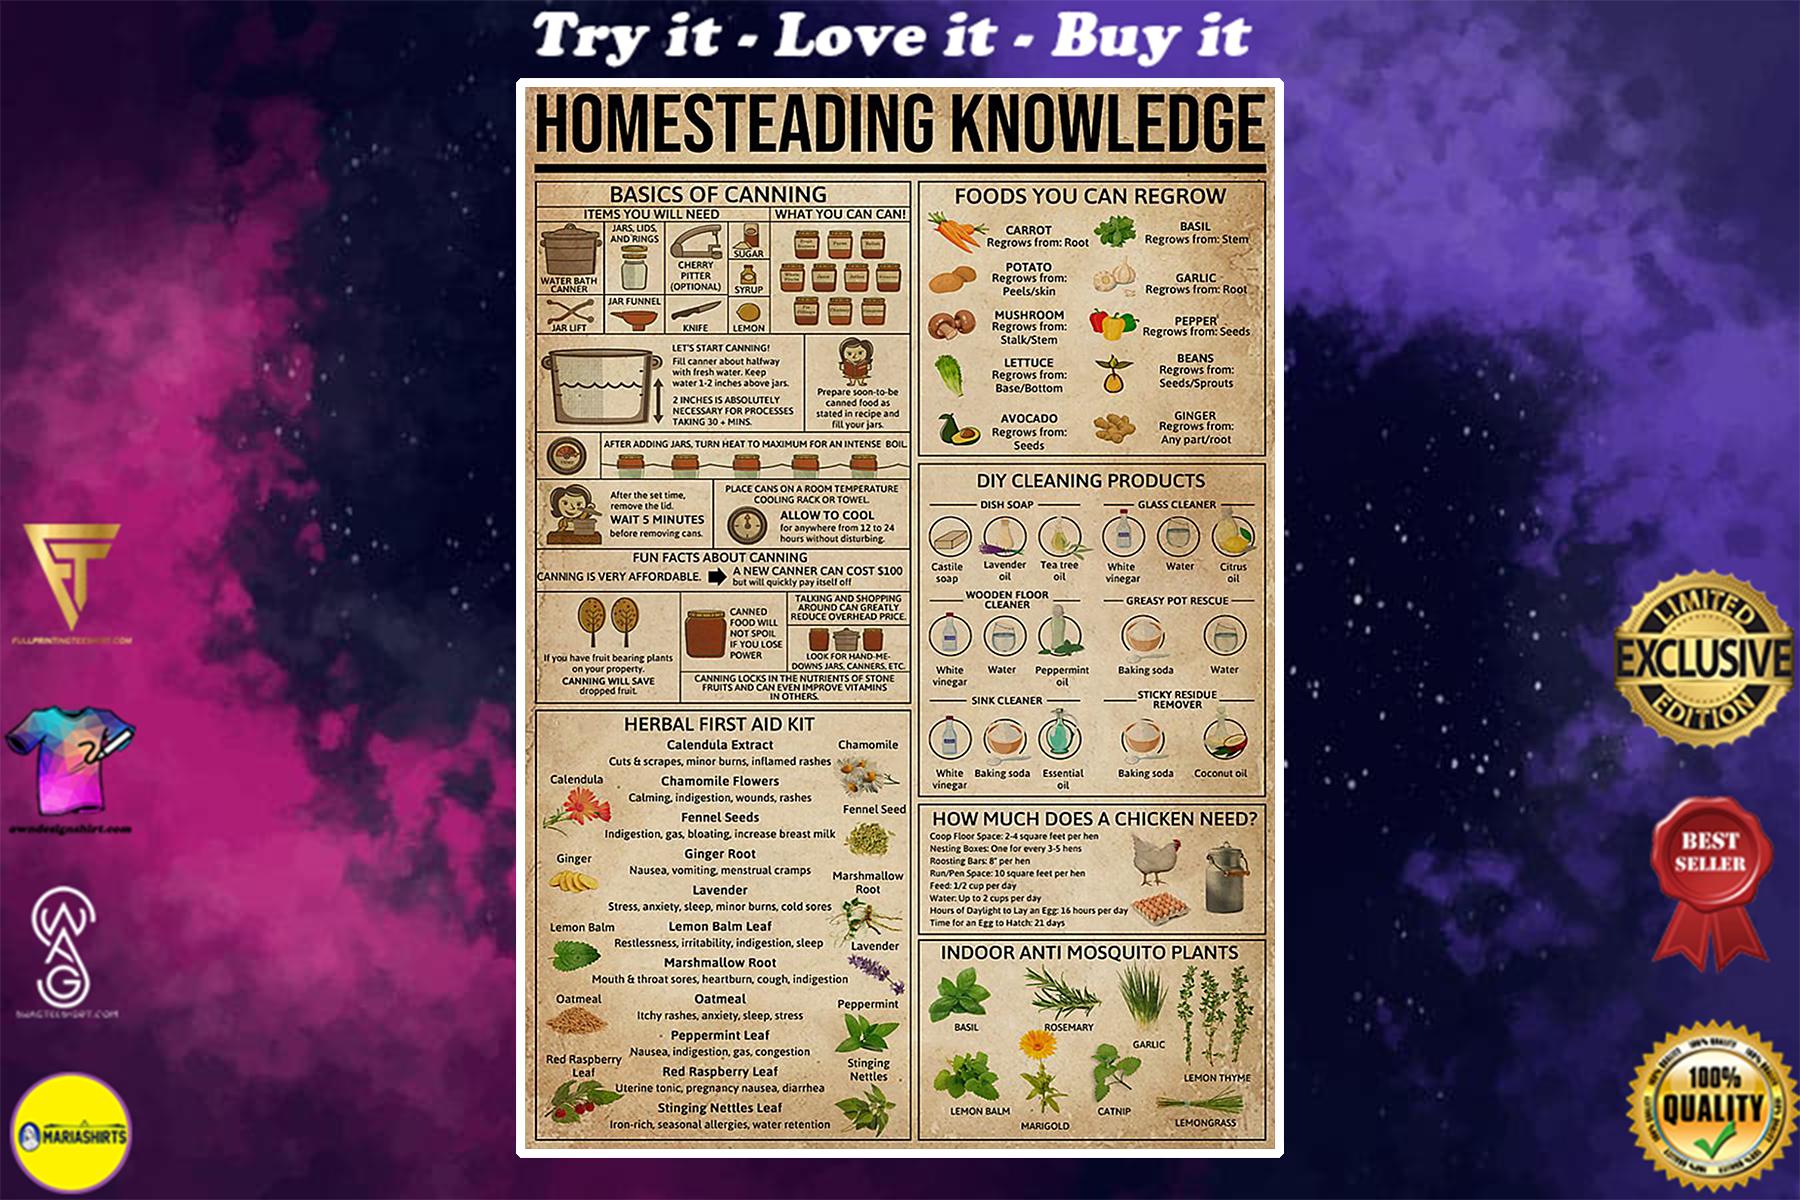 vintage homesteading knowledge poster